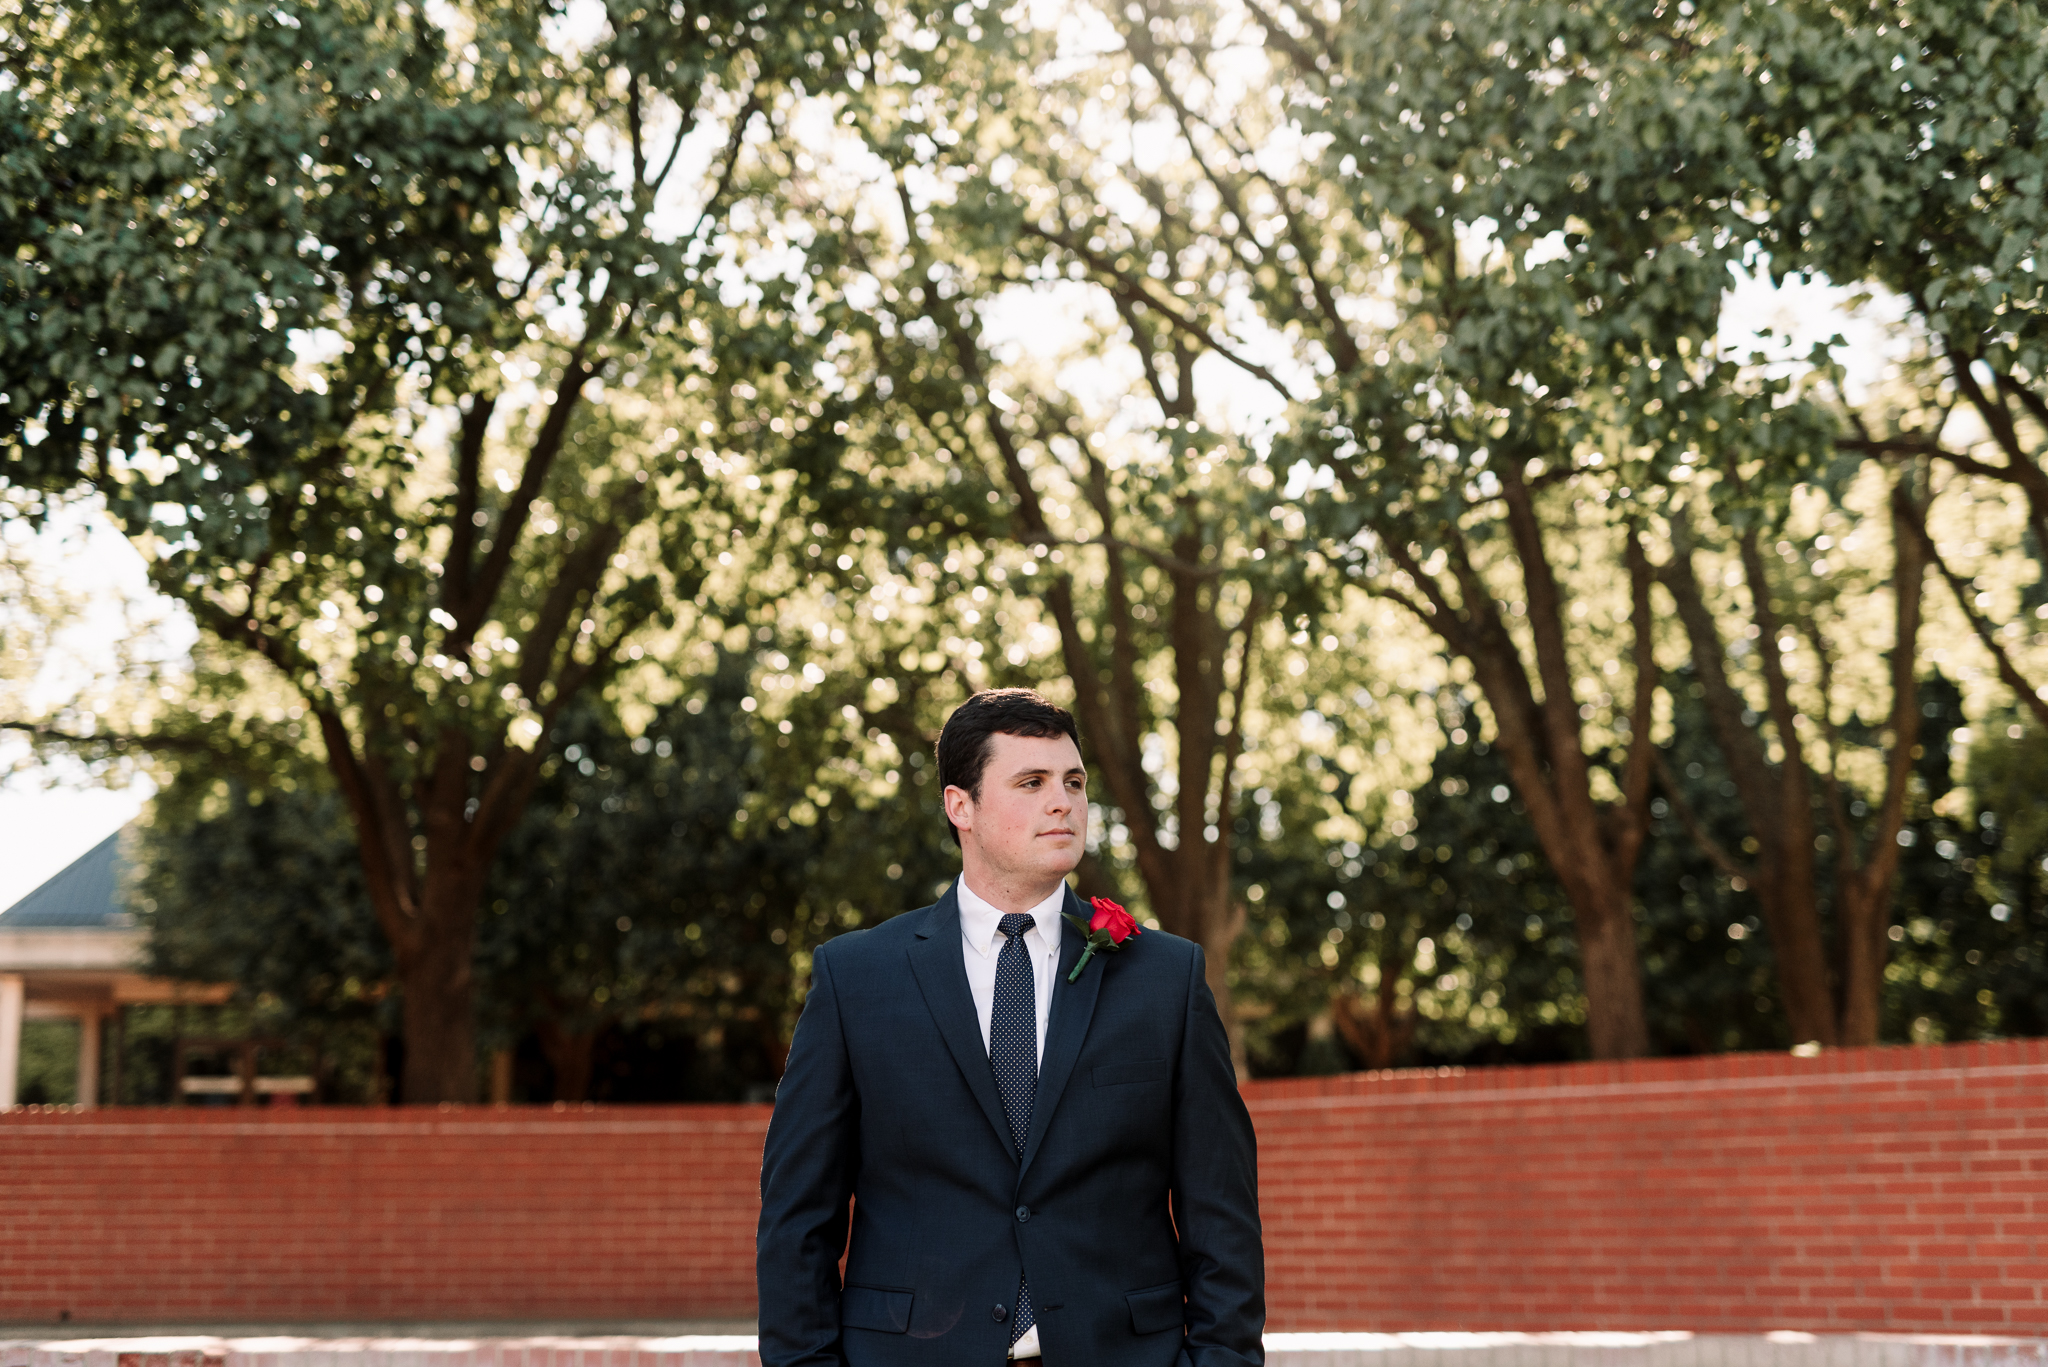 Oklahoma-Christian-University-Wedding-7966.jpg